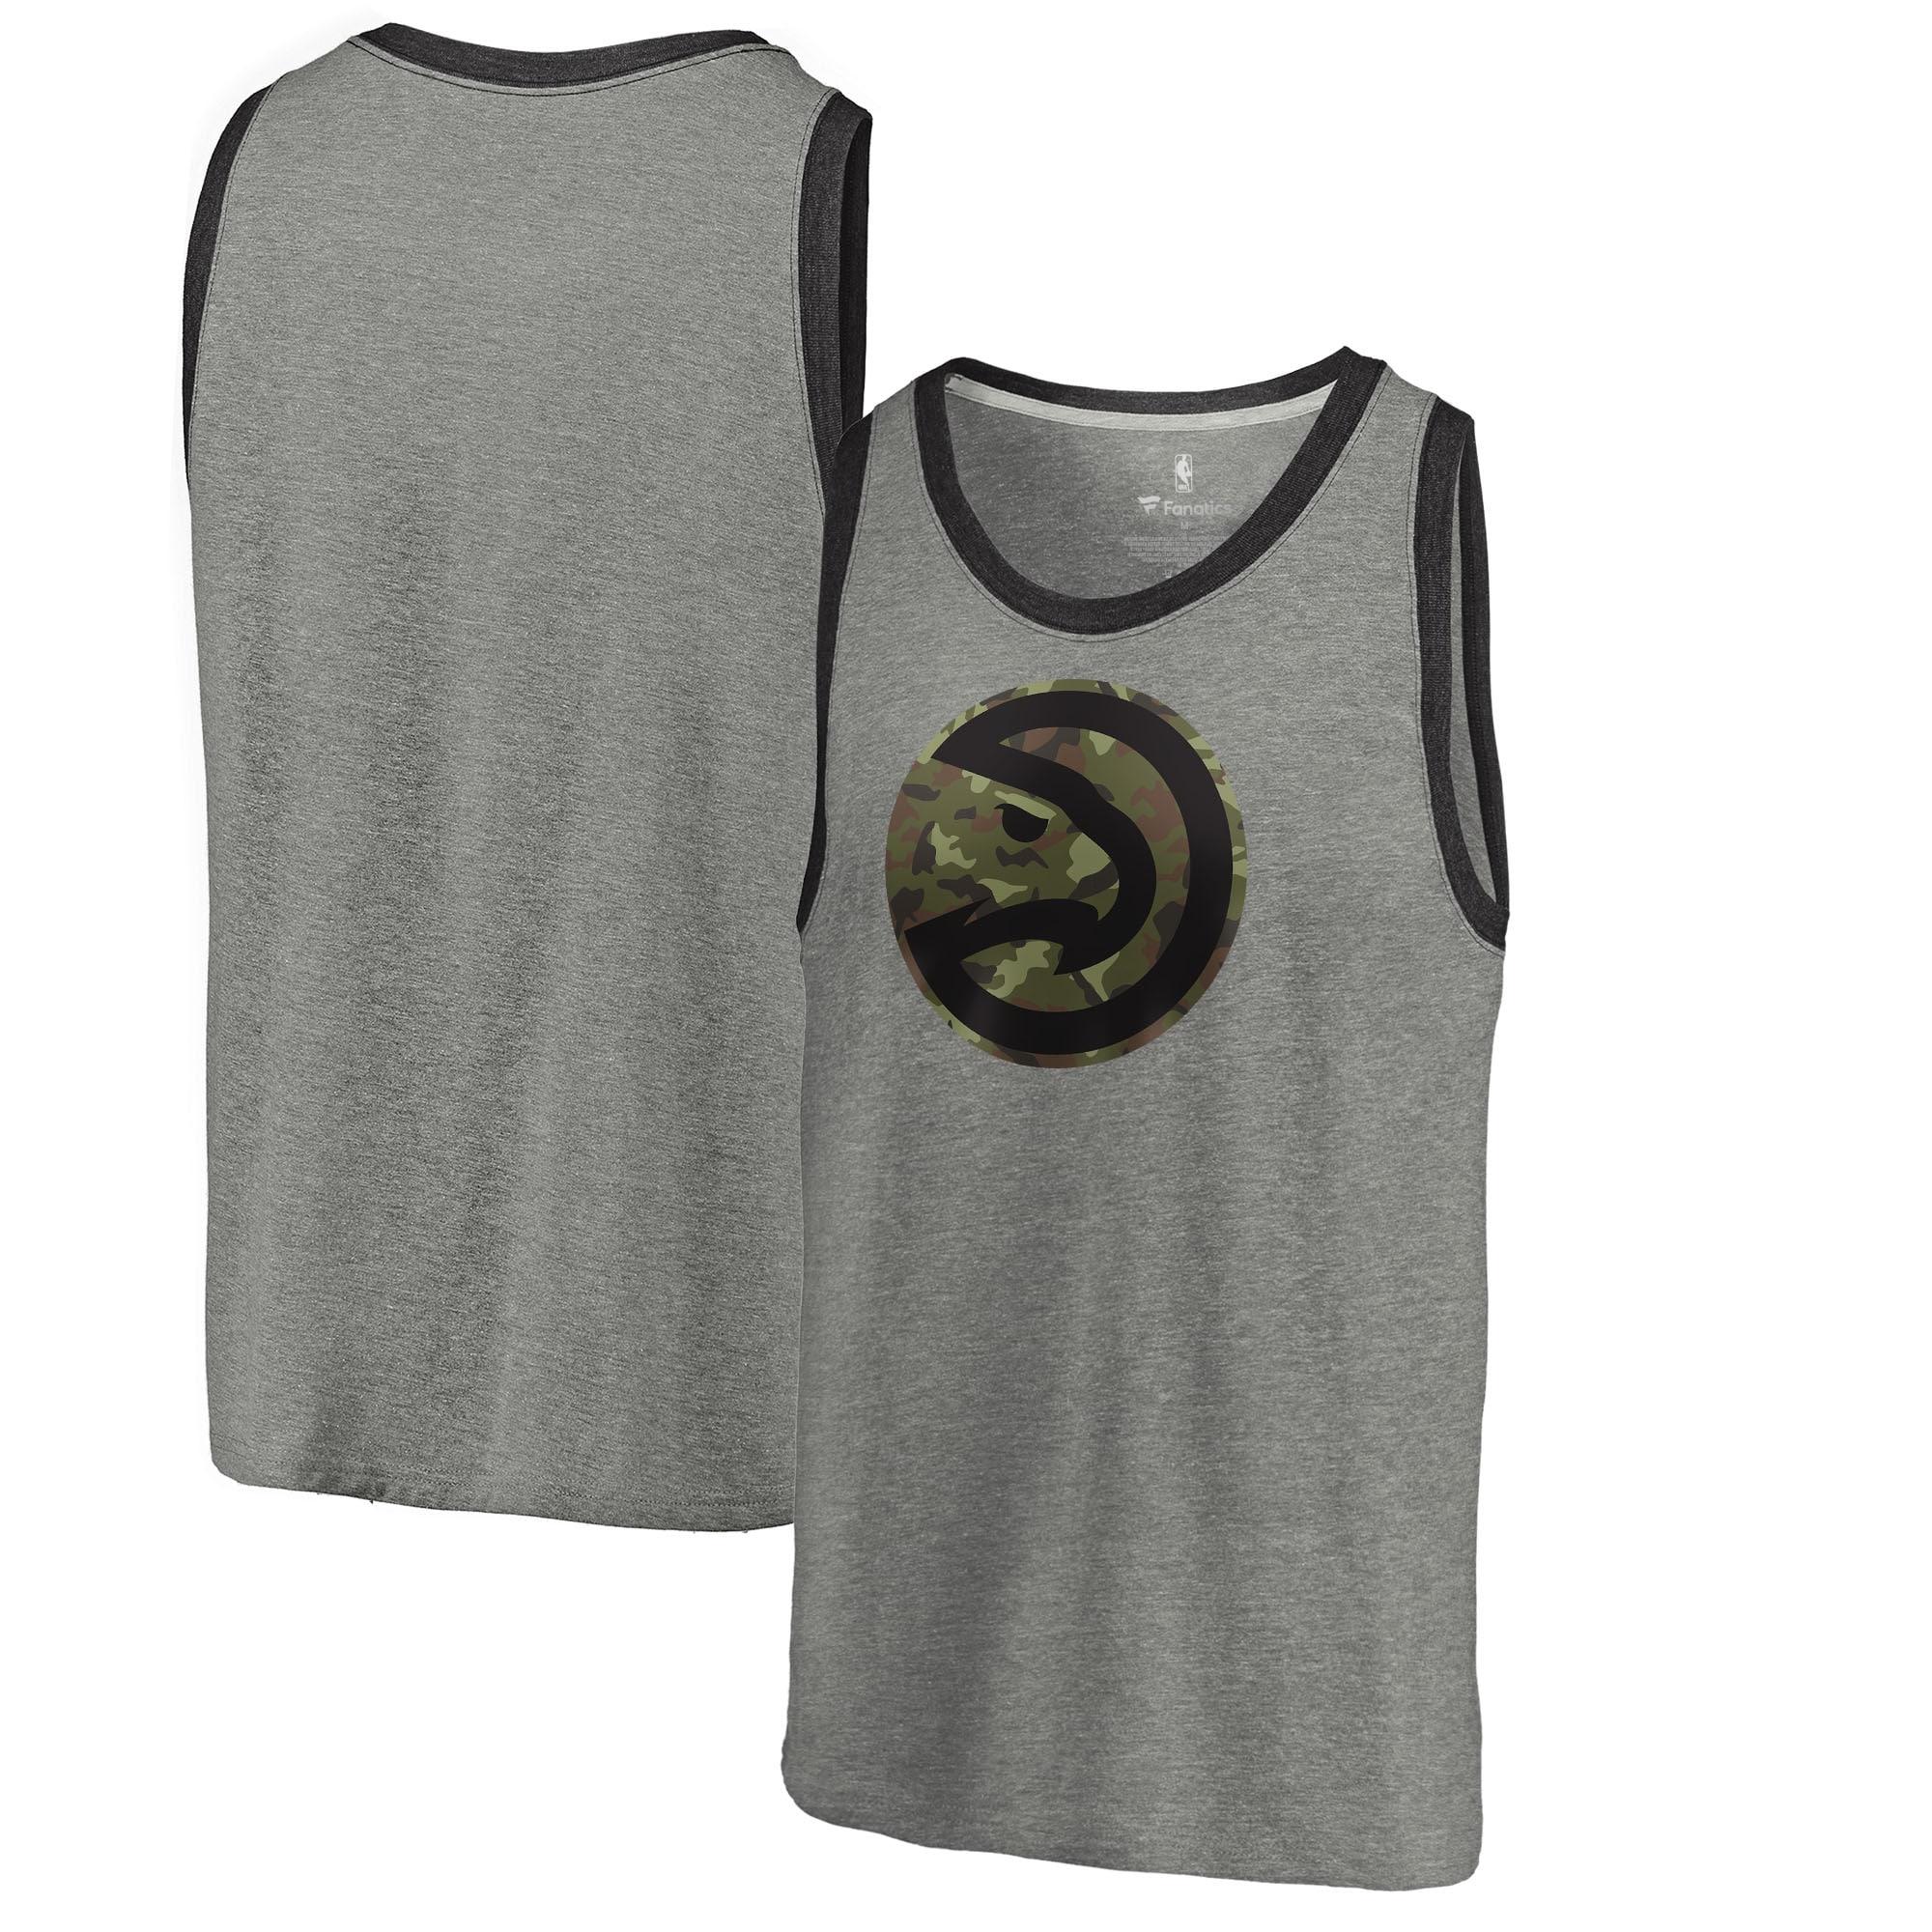 Atlanta Hawks Fanatics Branded Camo Collection Prestige Tri-Blend Tank Top - Heathered Gray